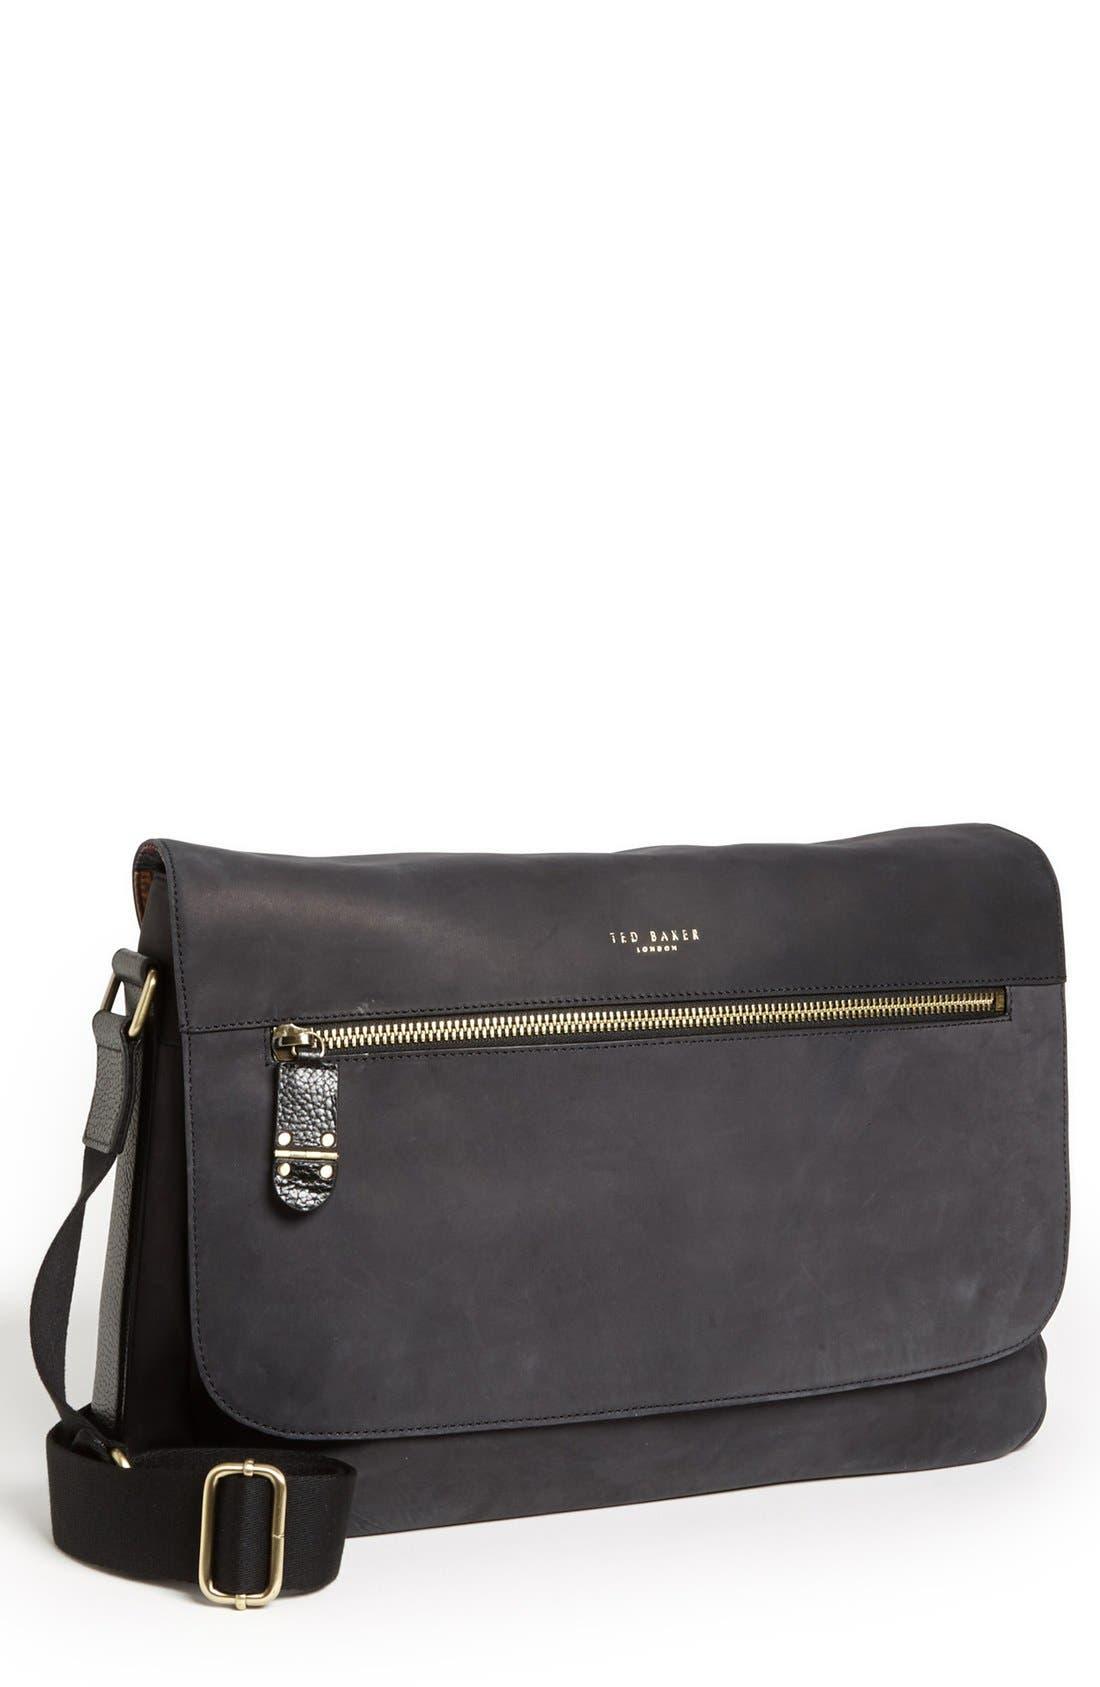 Main Image - Ted Baker London Leather Messenger Bag